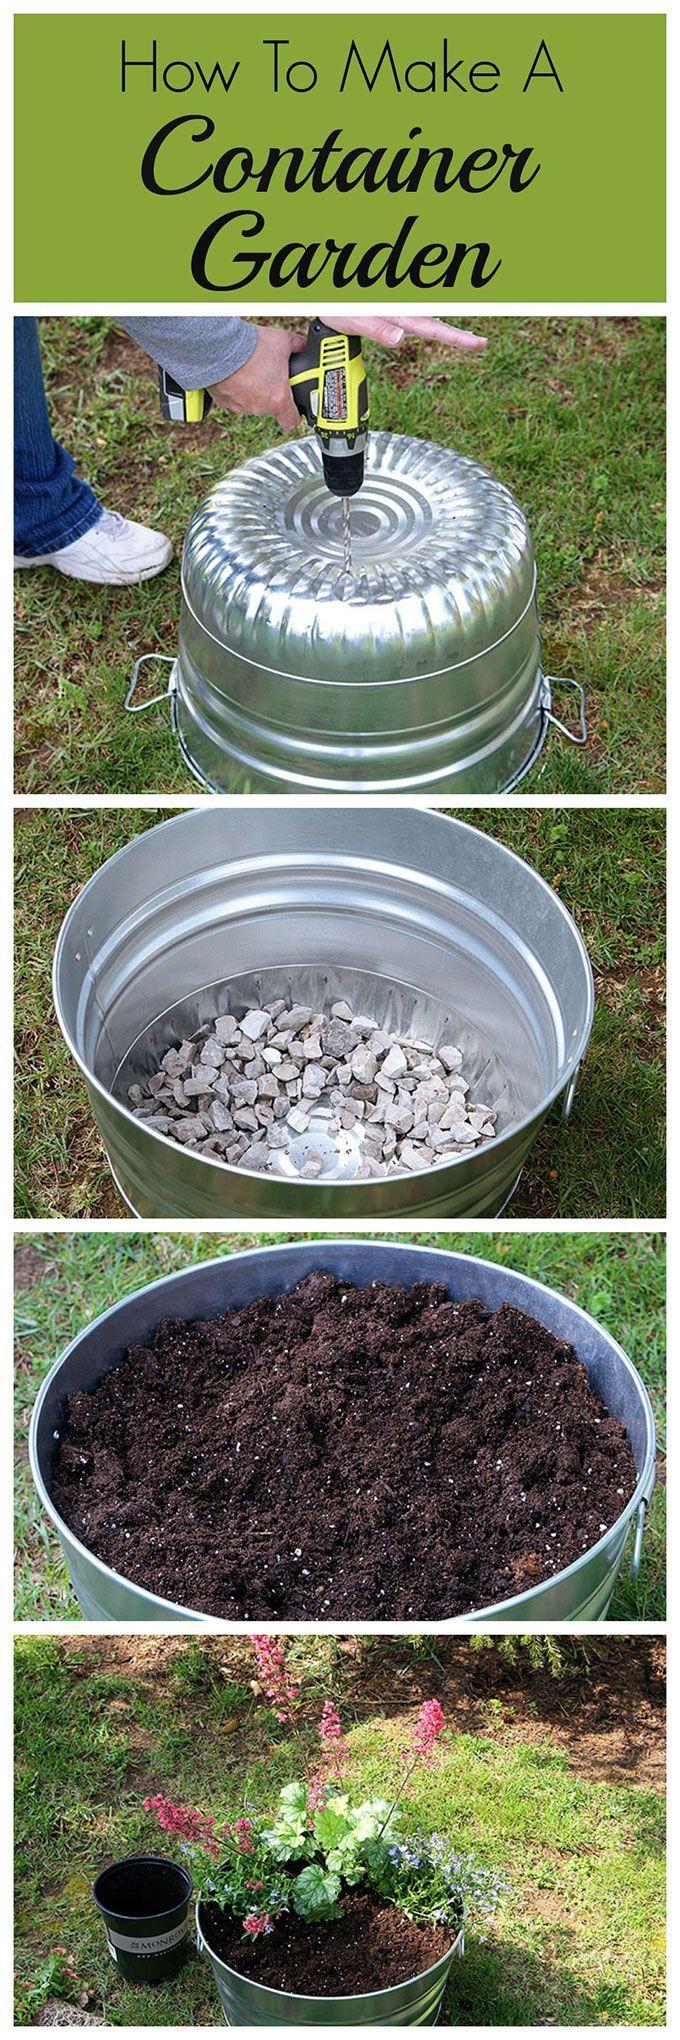 Best 25 Compost Container Ideas On Pinterest Kitchen